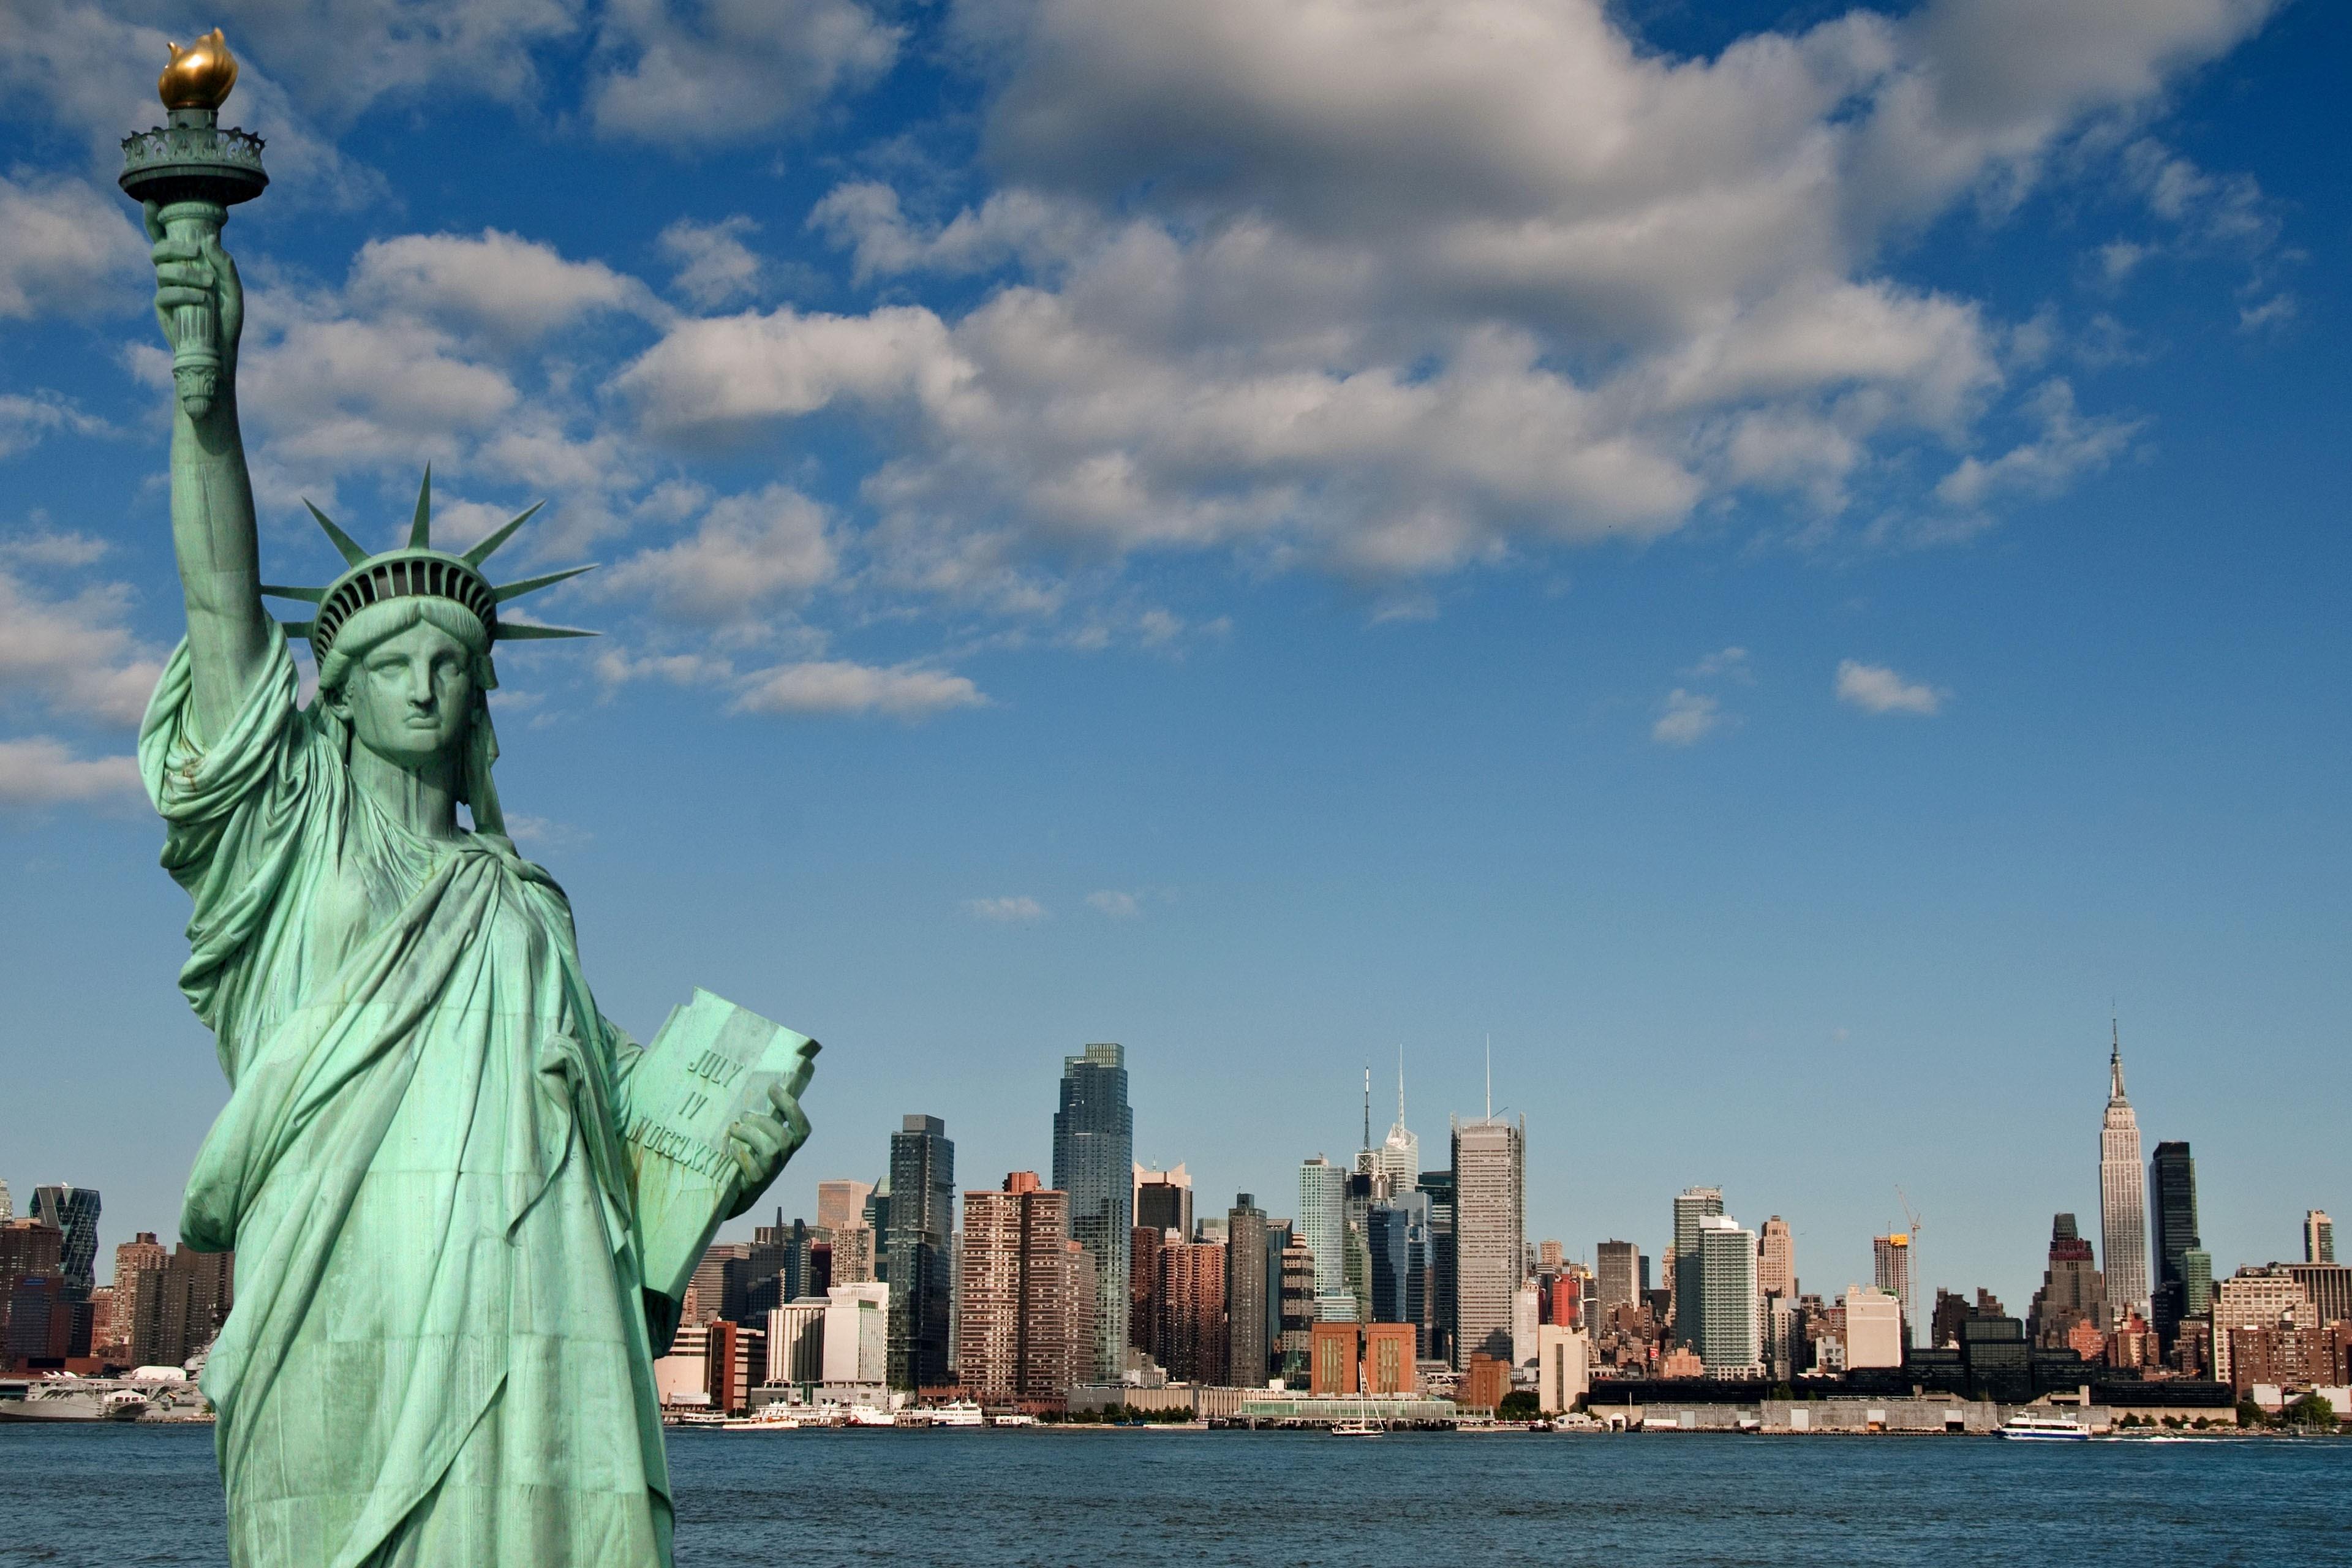 statue of liberty 4k wallpaper | hd wallpapers